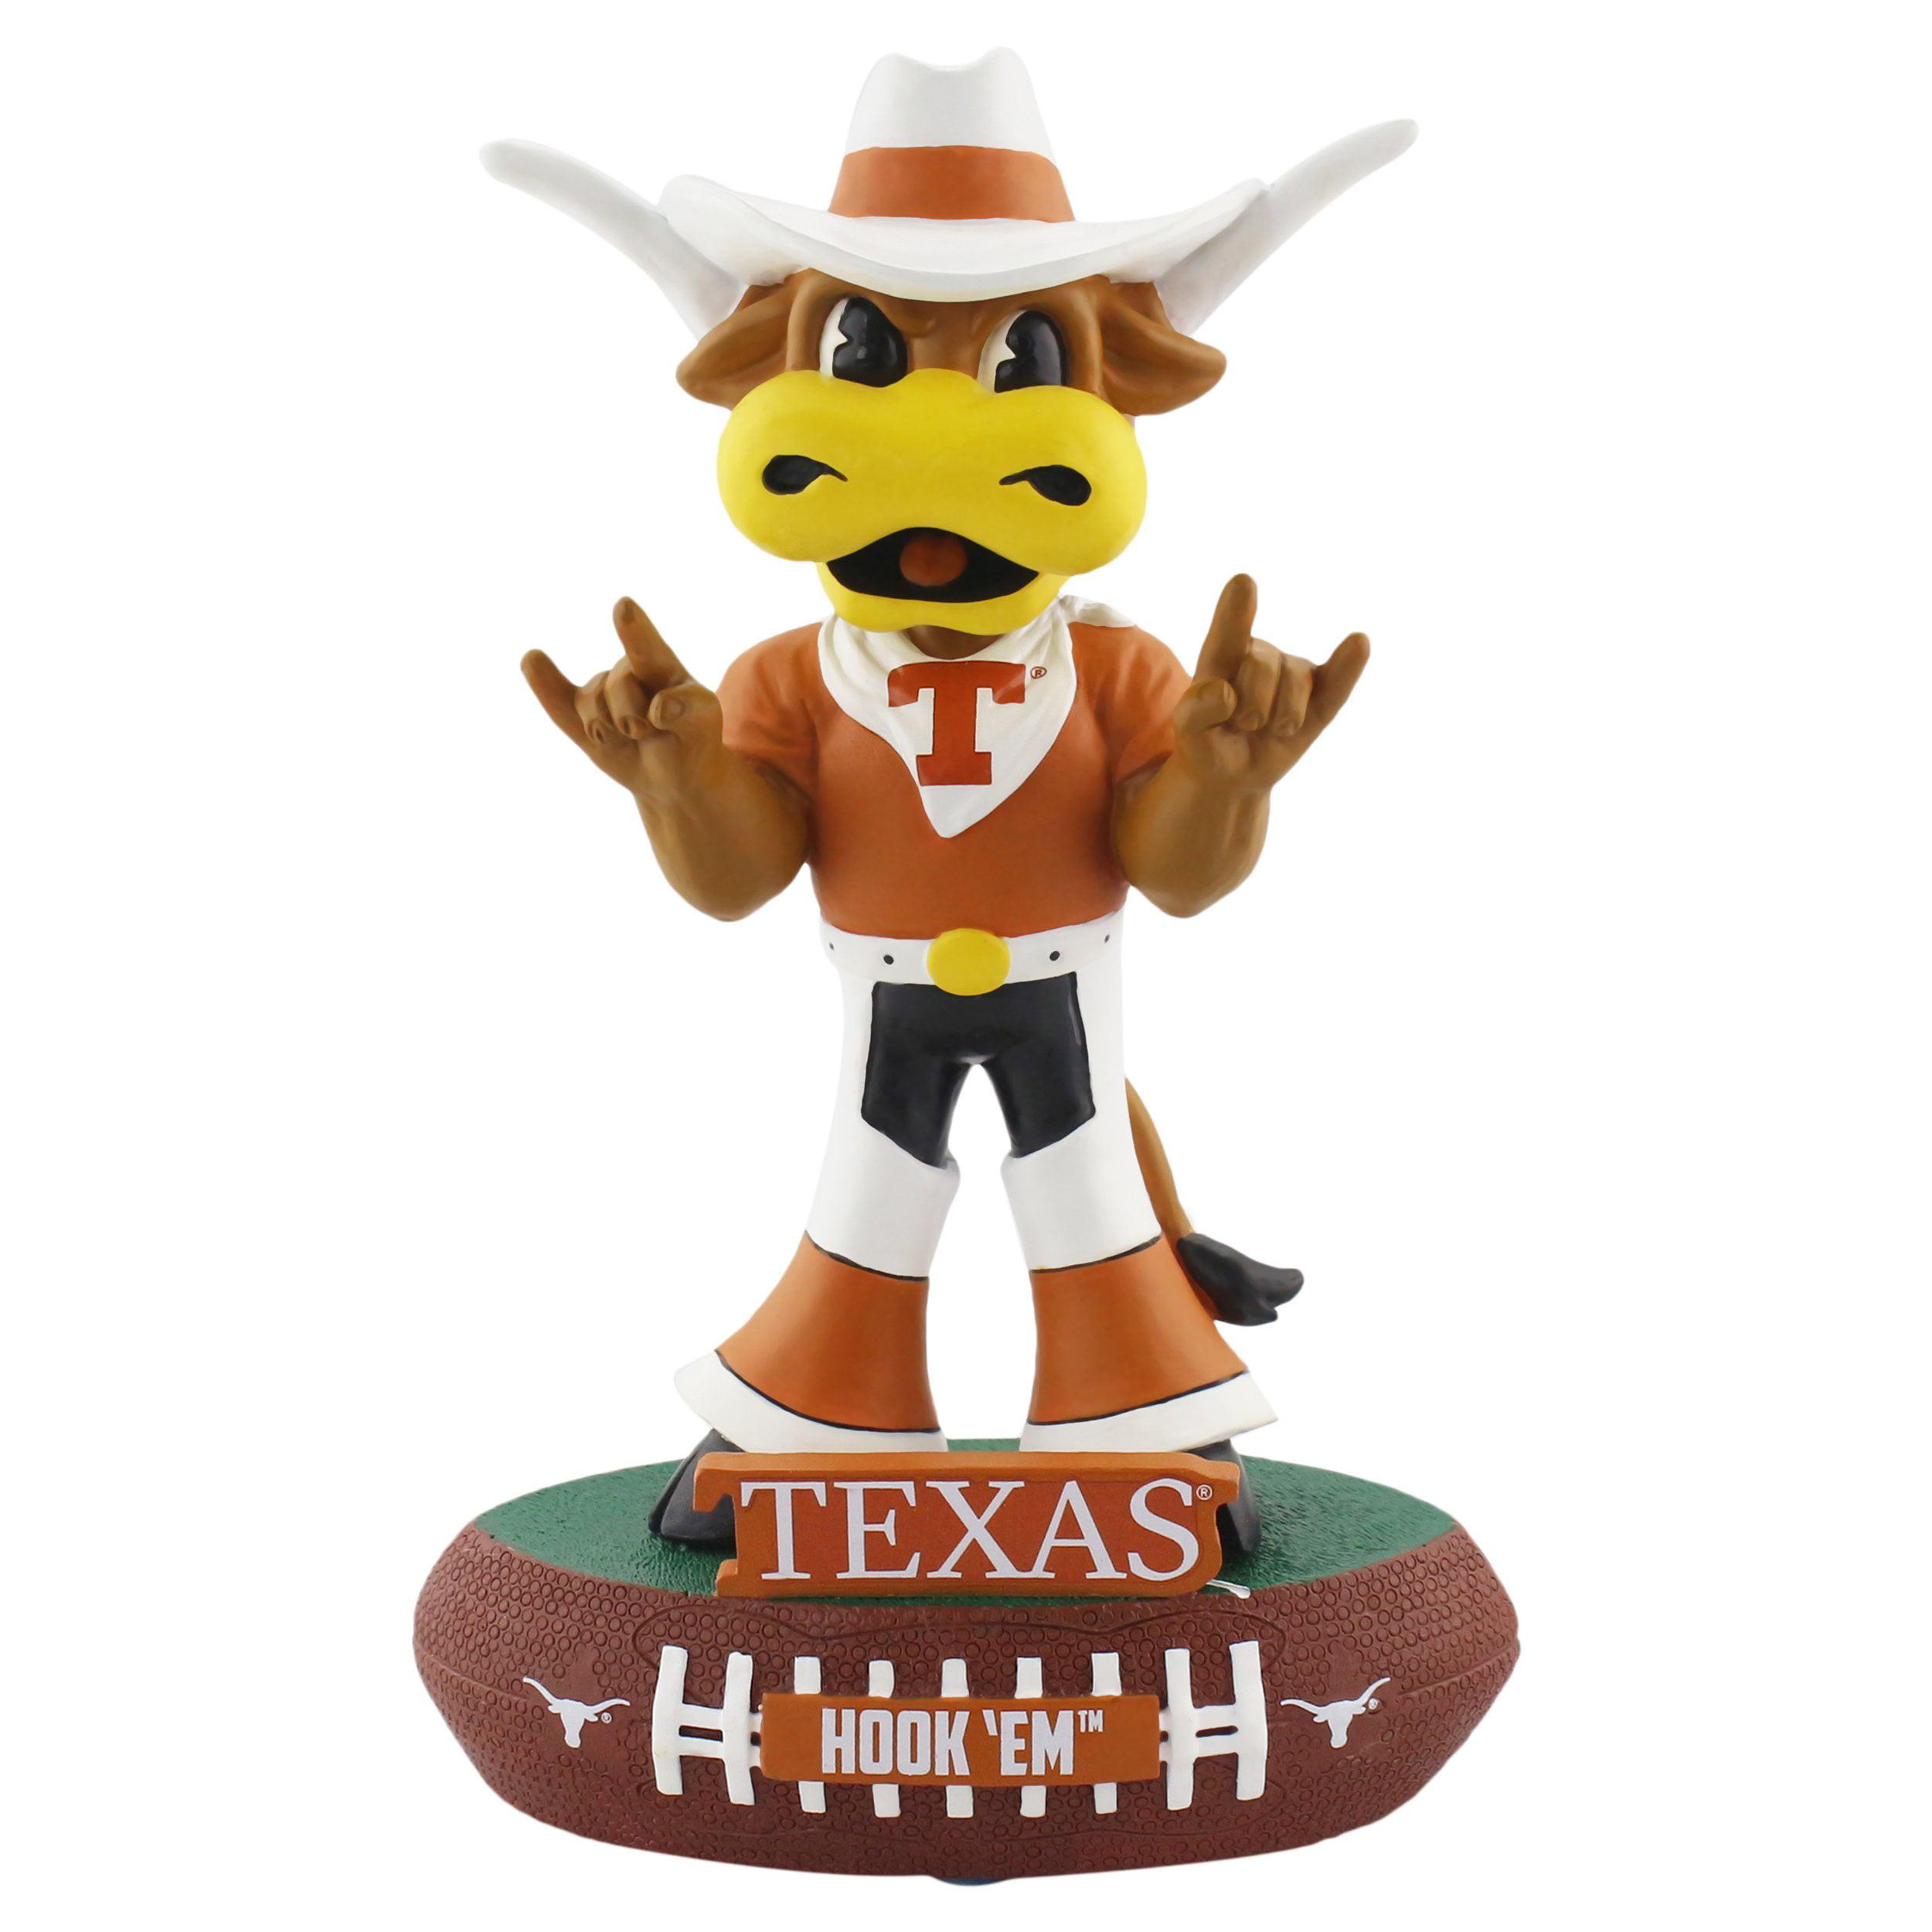 Texas Longhors Mascot Texas Longhorns Baller Special Edition Bobblehead NCAA